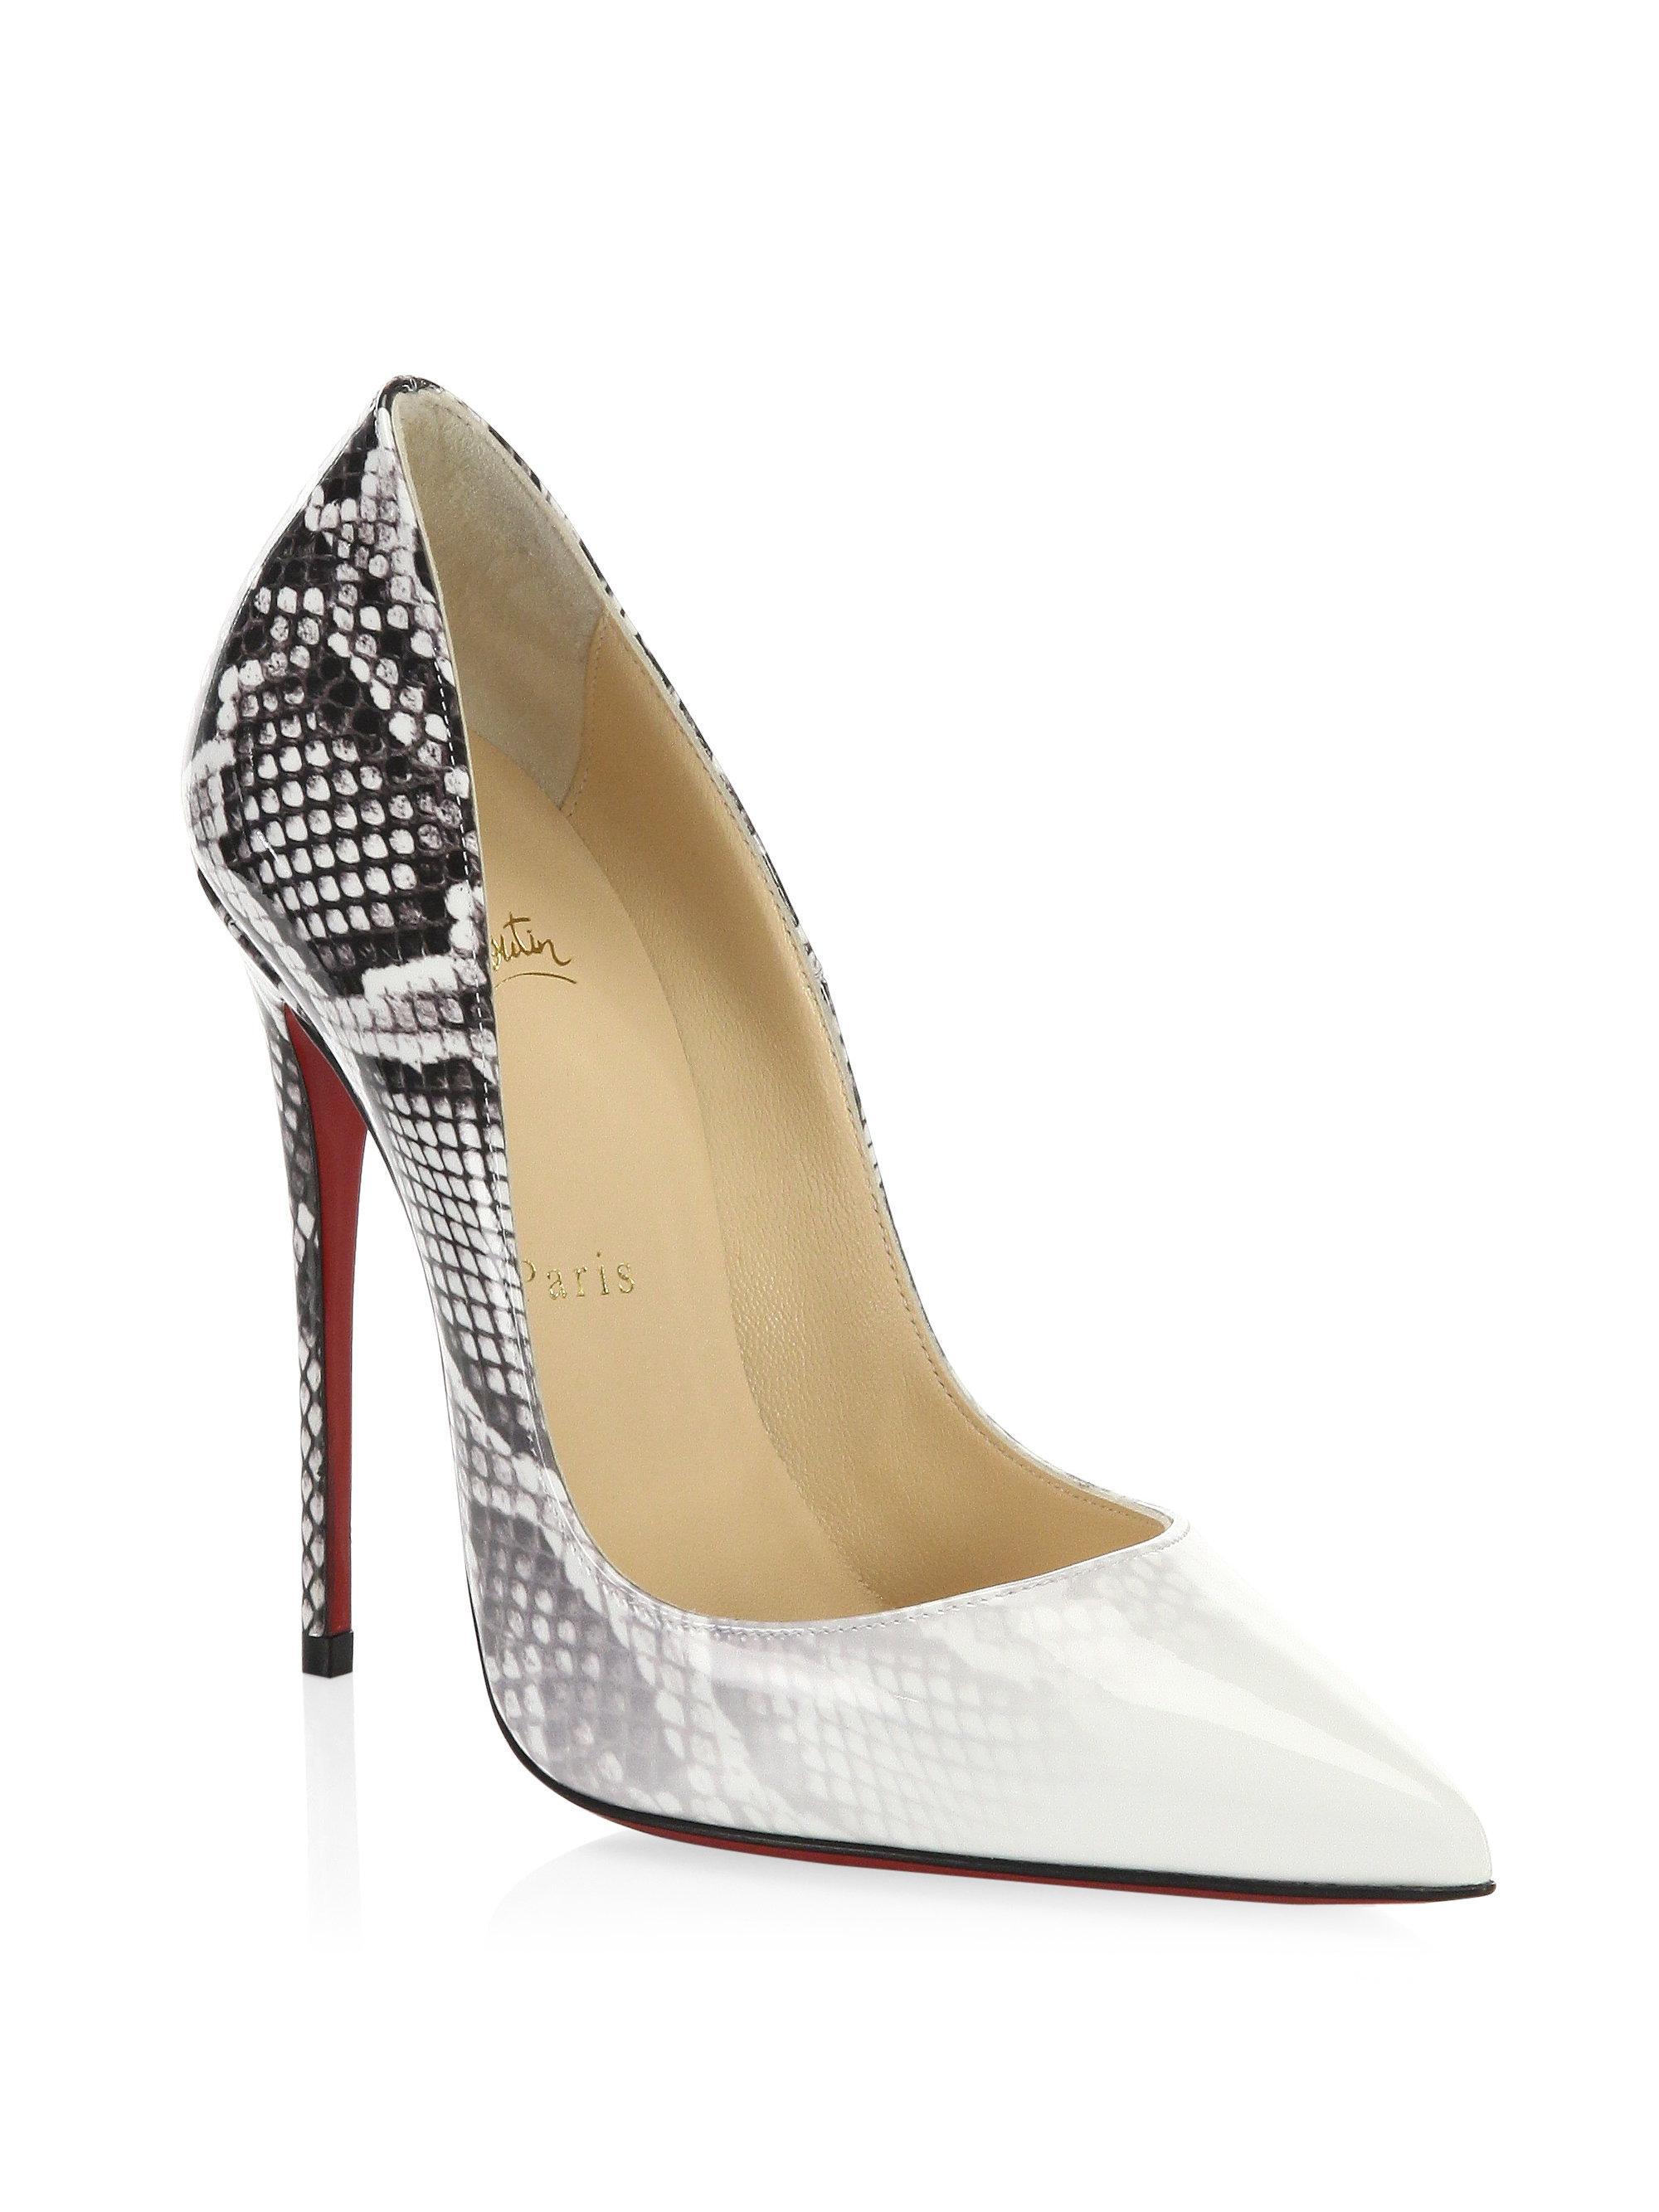 de0e160737d Christian Louboutin White So Kate 120 Patent Leather Pumps